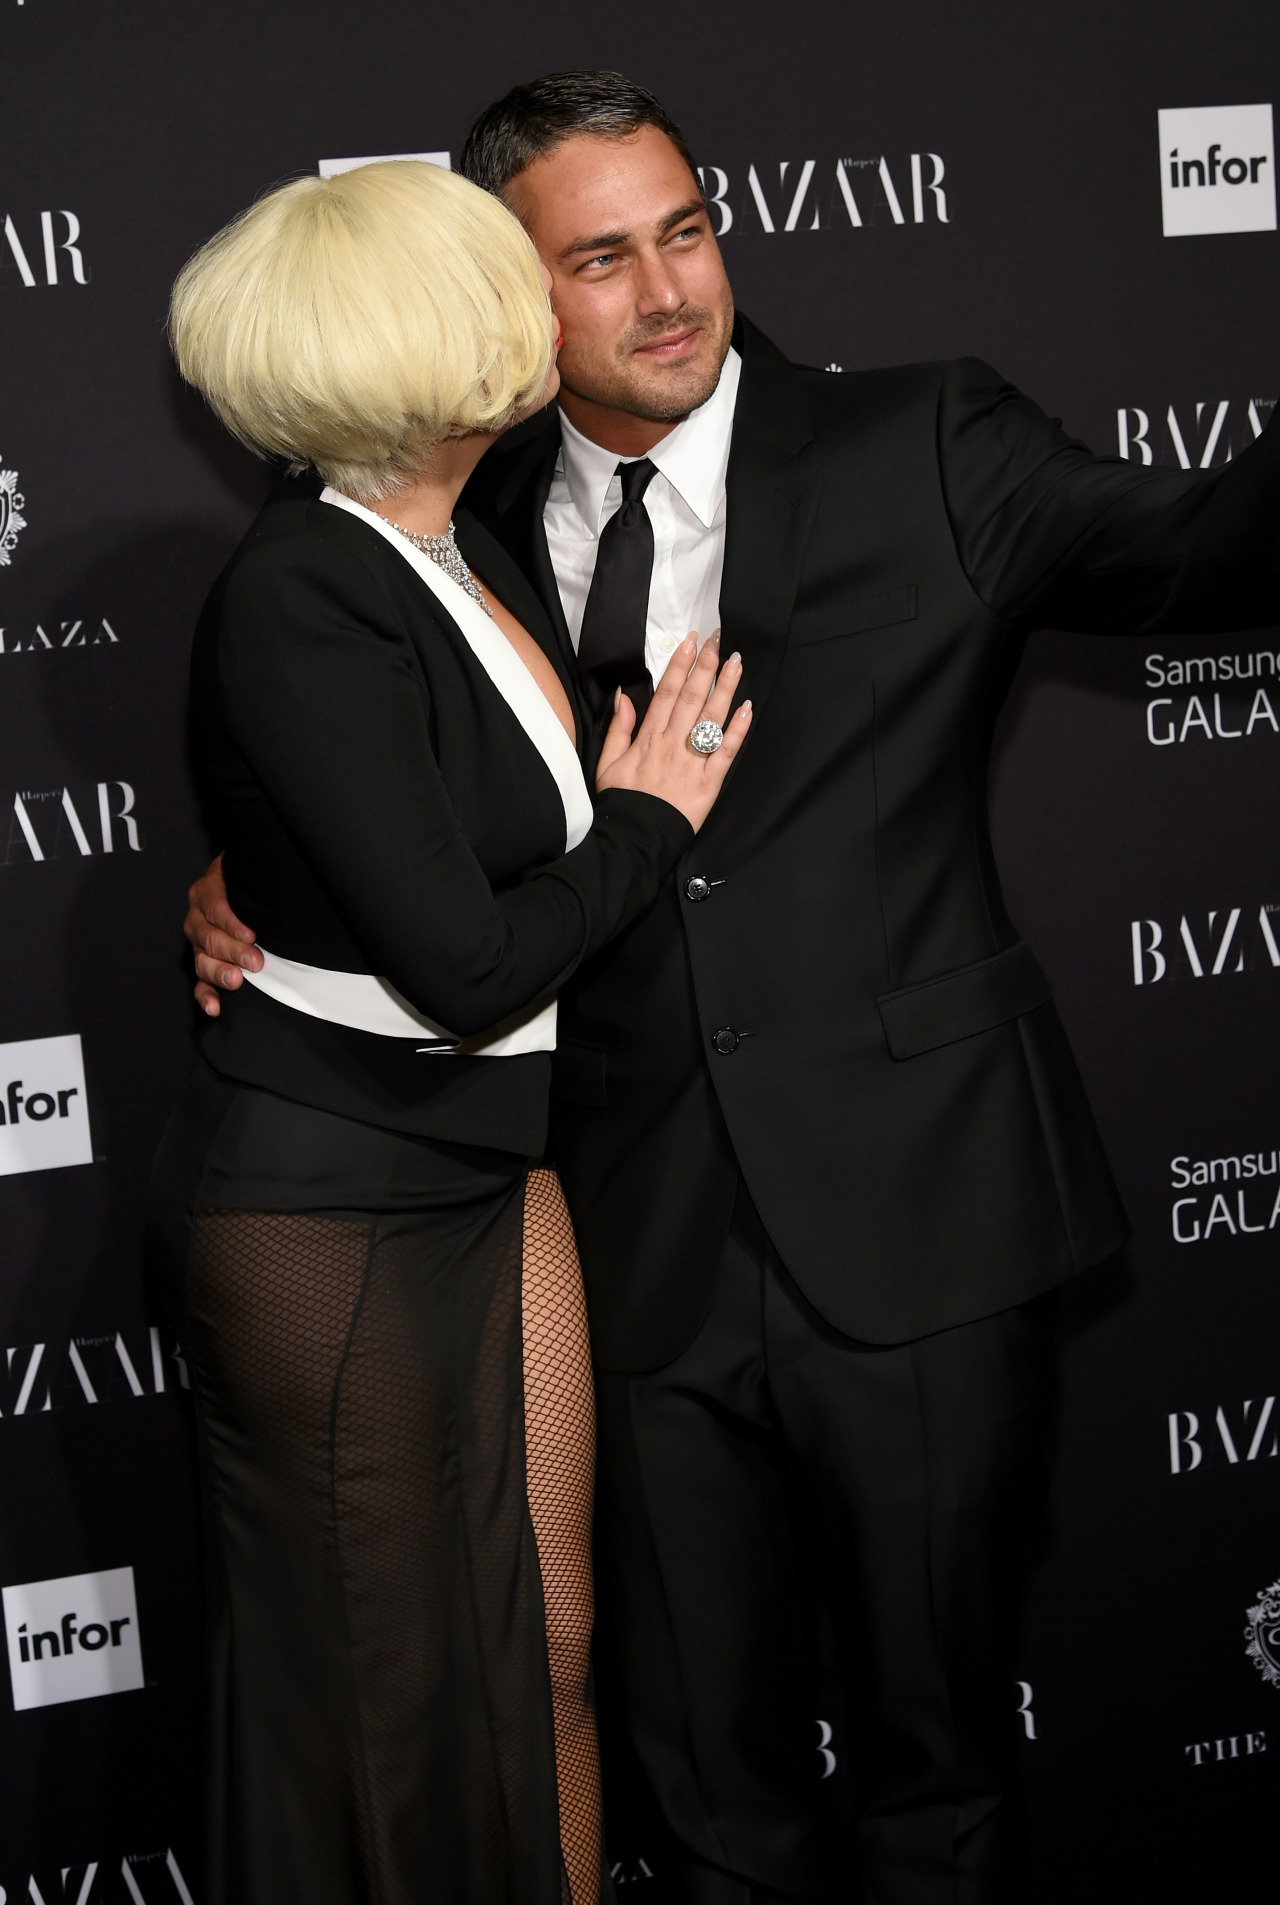 Lady Gaga and Taylor Kinney. - Page 3 Tumblr_nbhkz0oEqB1rz7rr7o3_1280